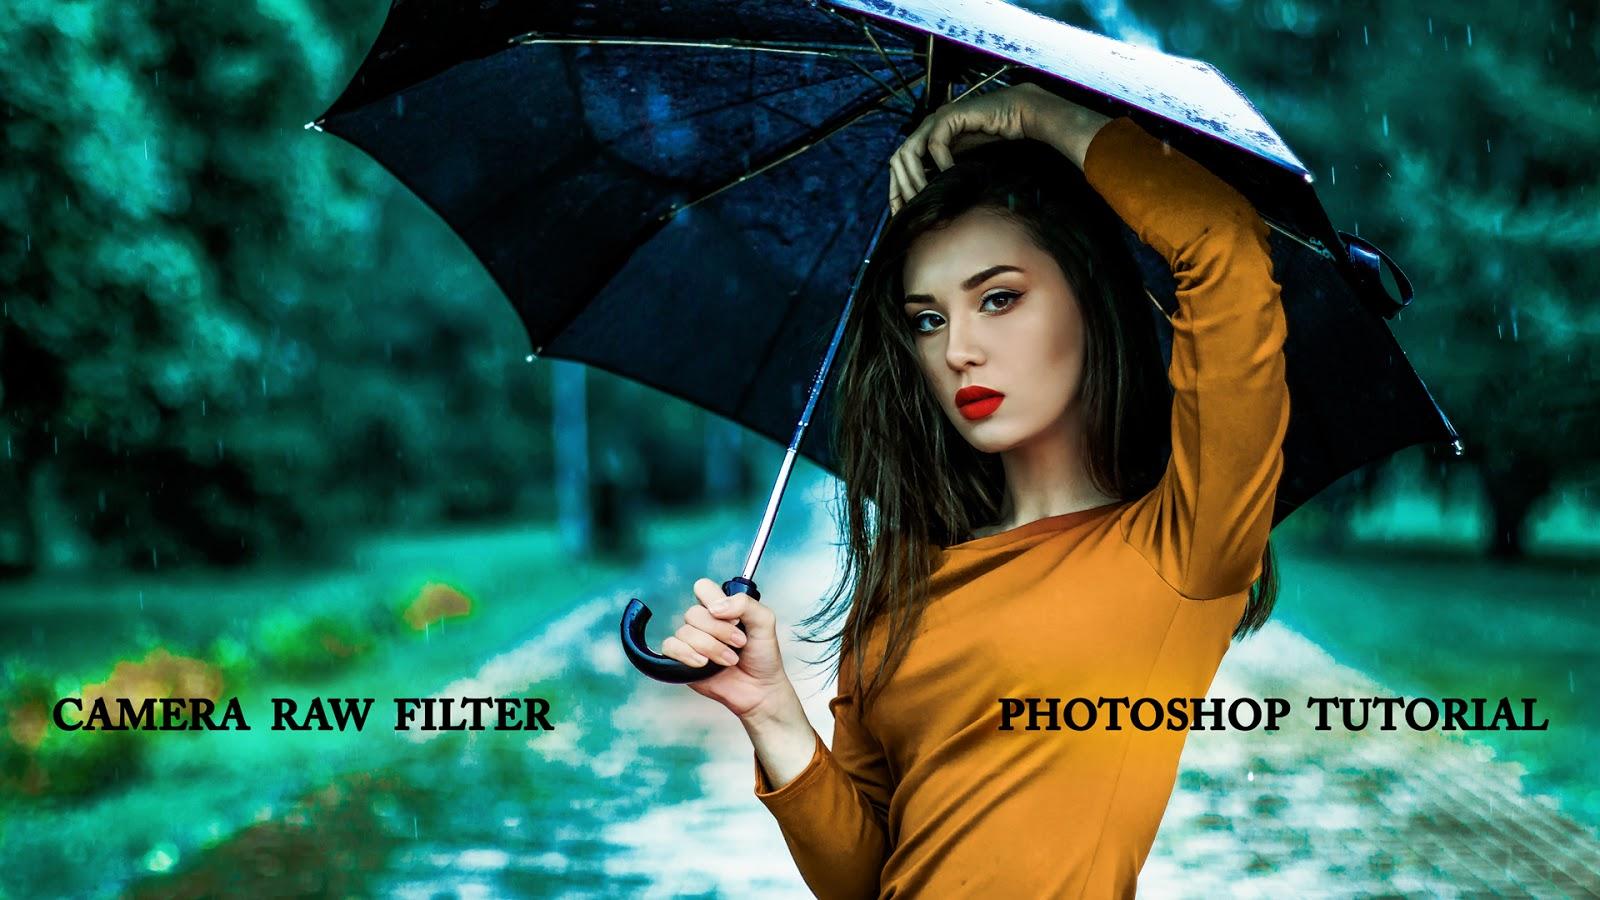 Lovely Photos using Camera Raw Filter Photoshop - Devil PSD